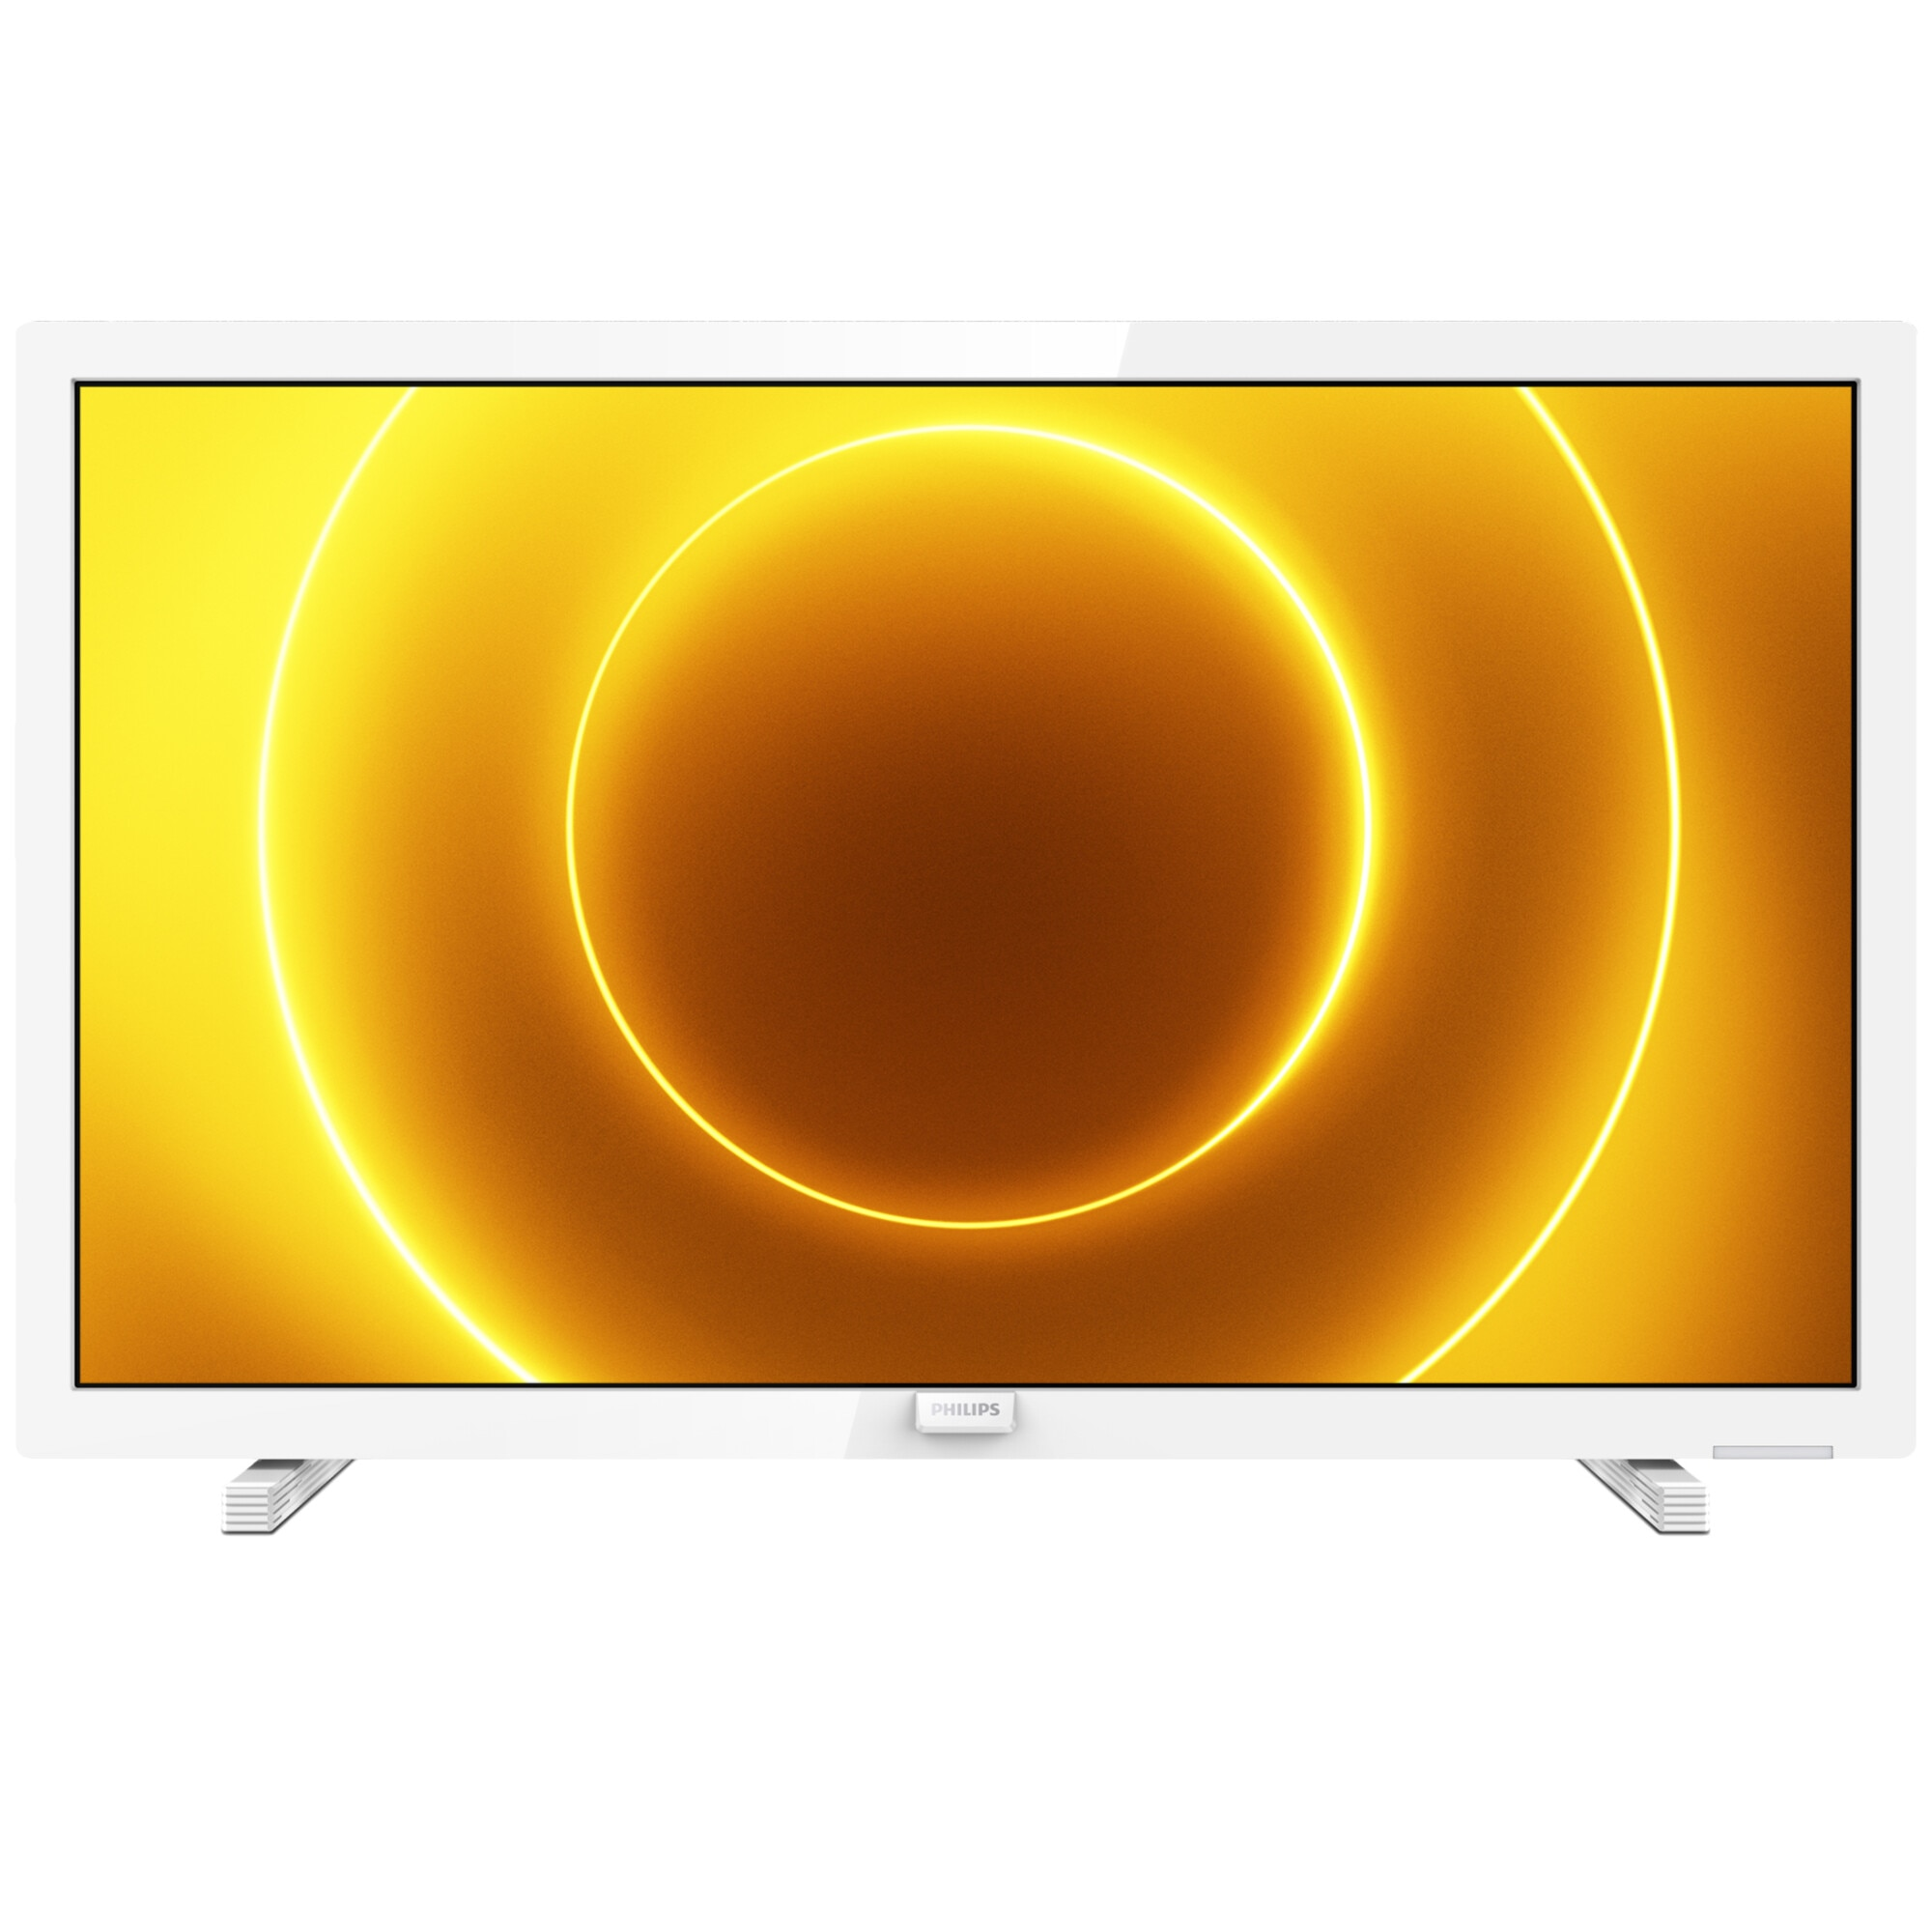 Fotografie Televizor Philips 24PFS5535/12, 60 cm, Full HD, LED adaptor masina 12V, Clasa F